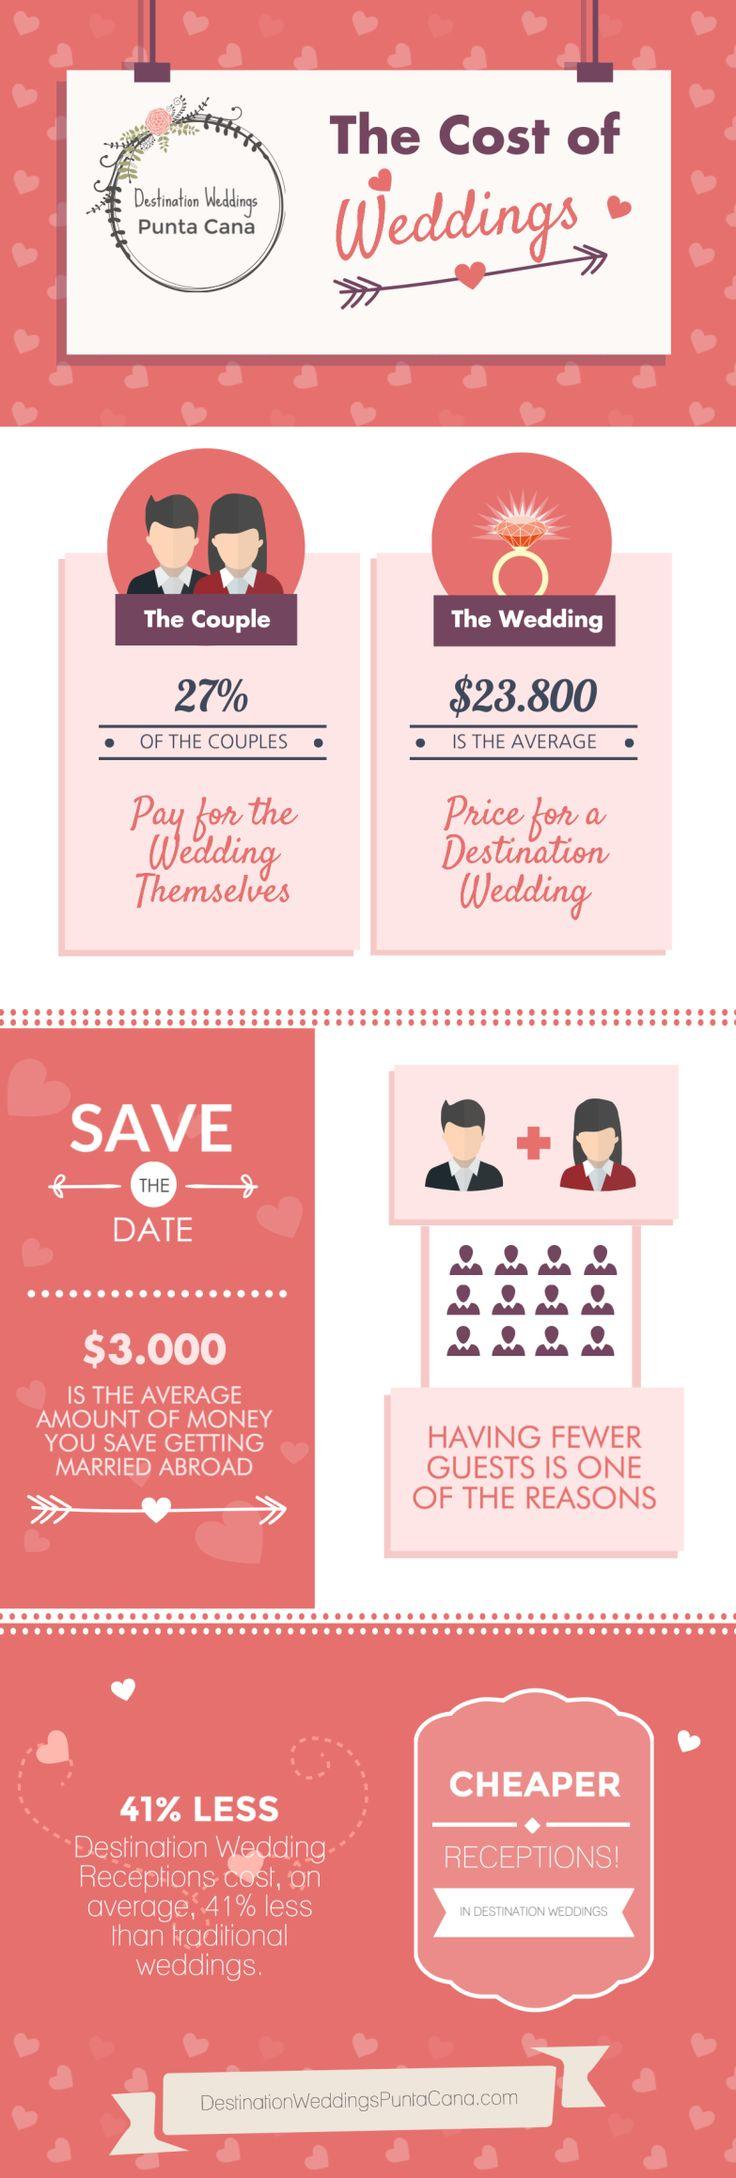 httpdestinationweddingspuntacanacom the cost of weddings 27 of the couples destination